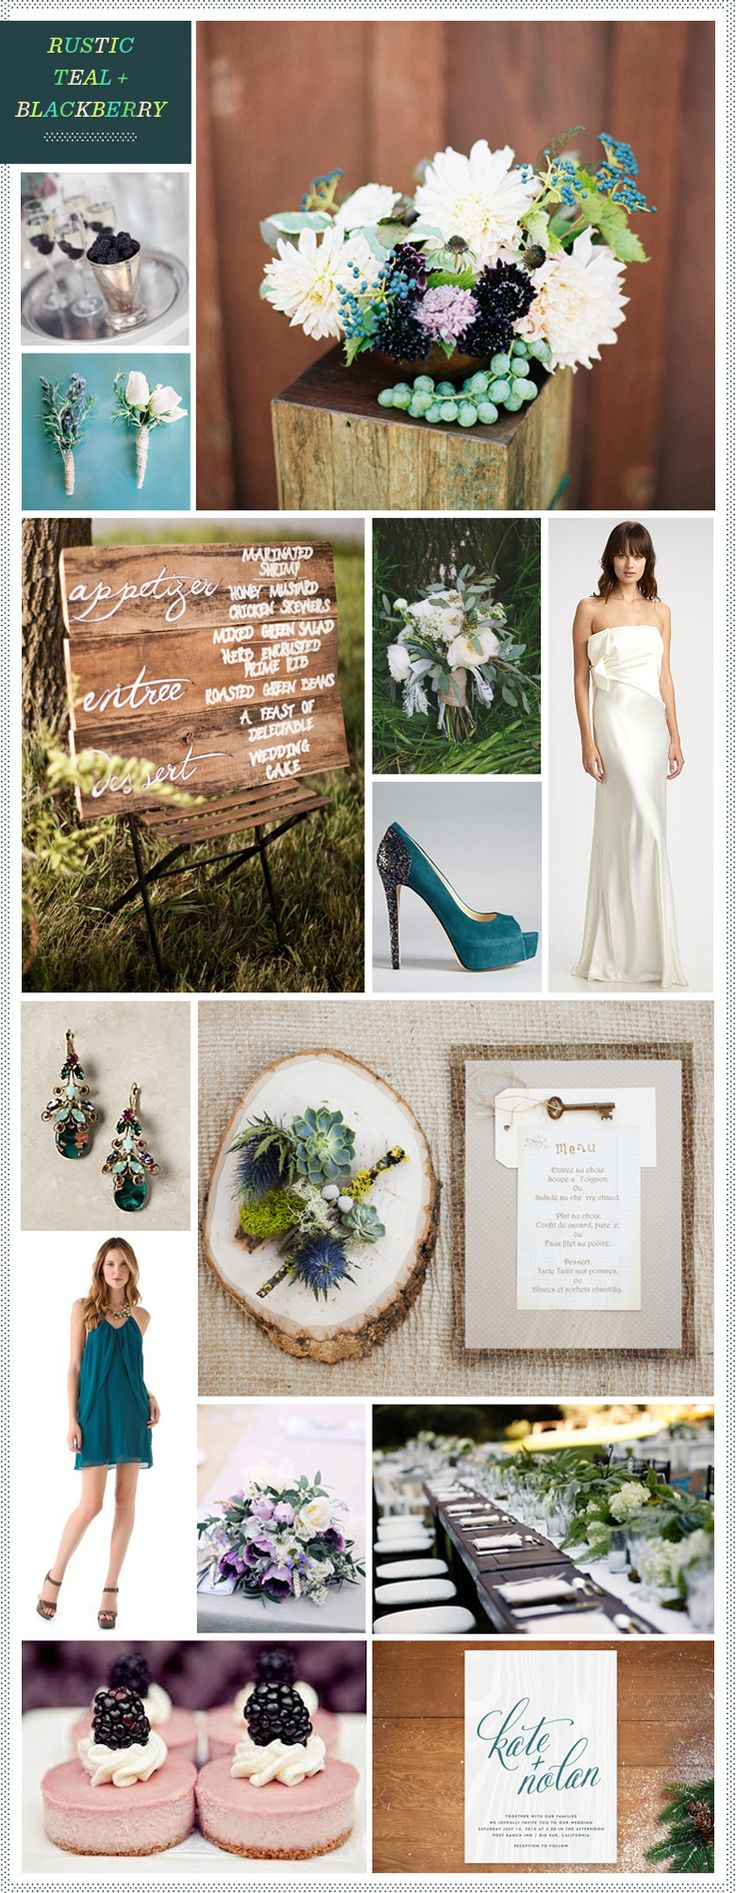 Rustic Teal + Blackberry Wedding Inspiration